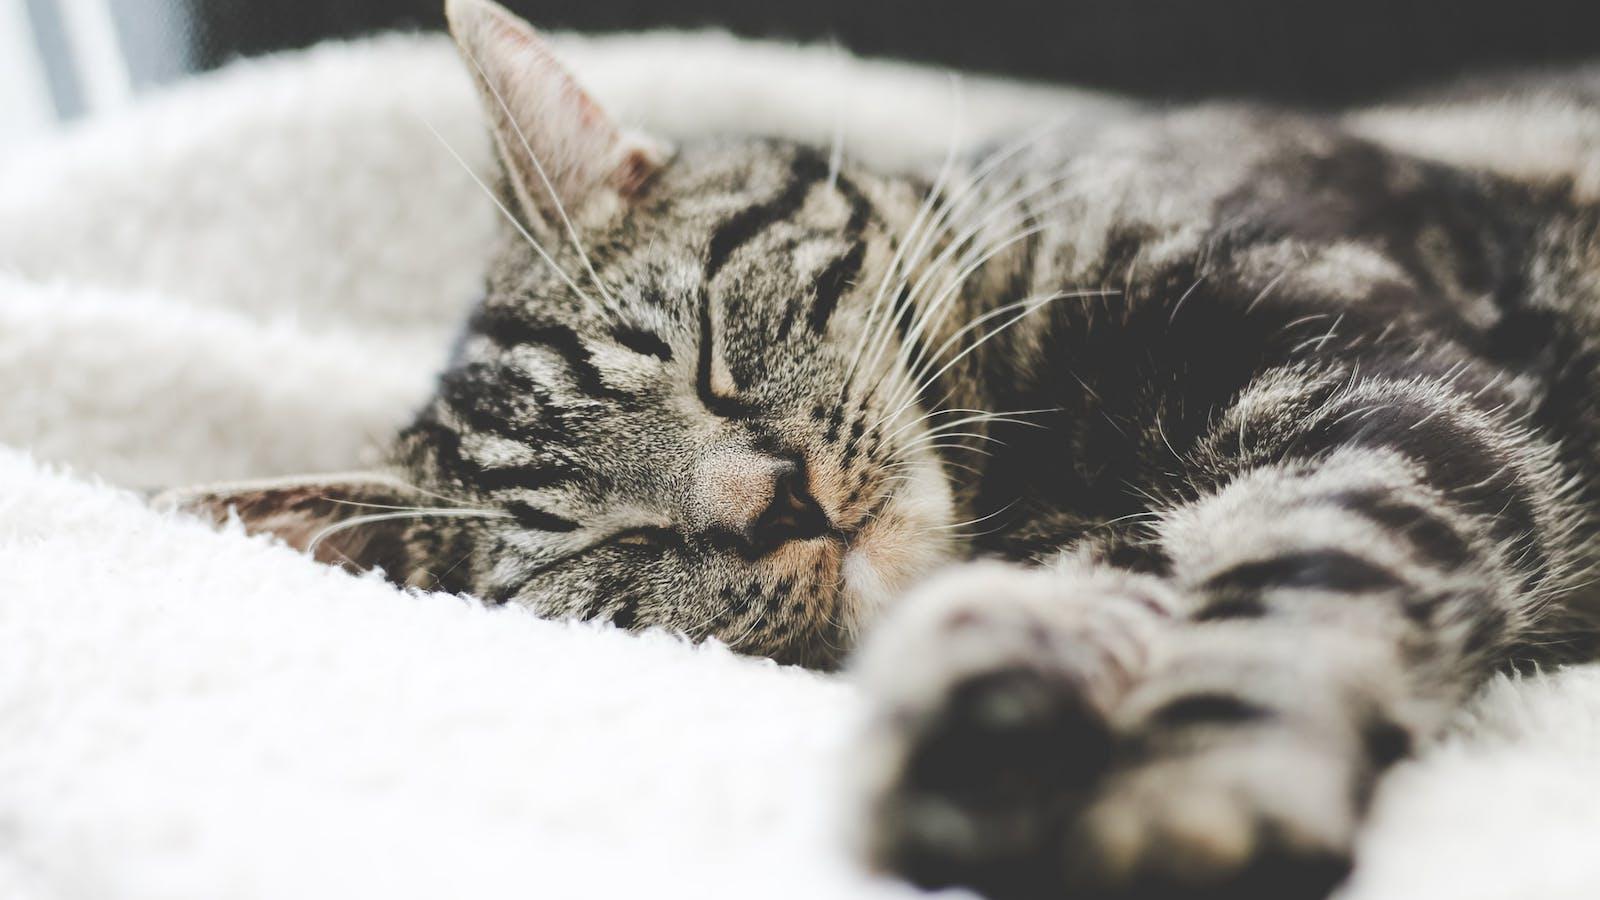 Photo d'un chat en train de dormir